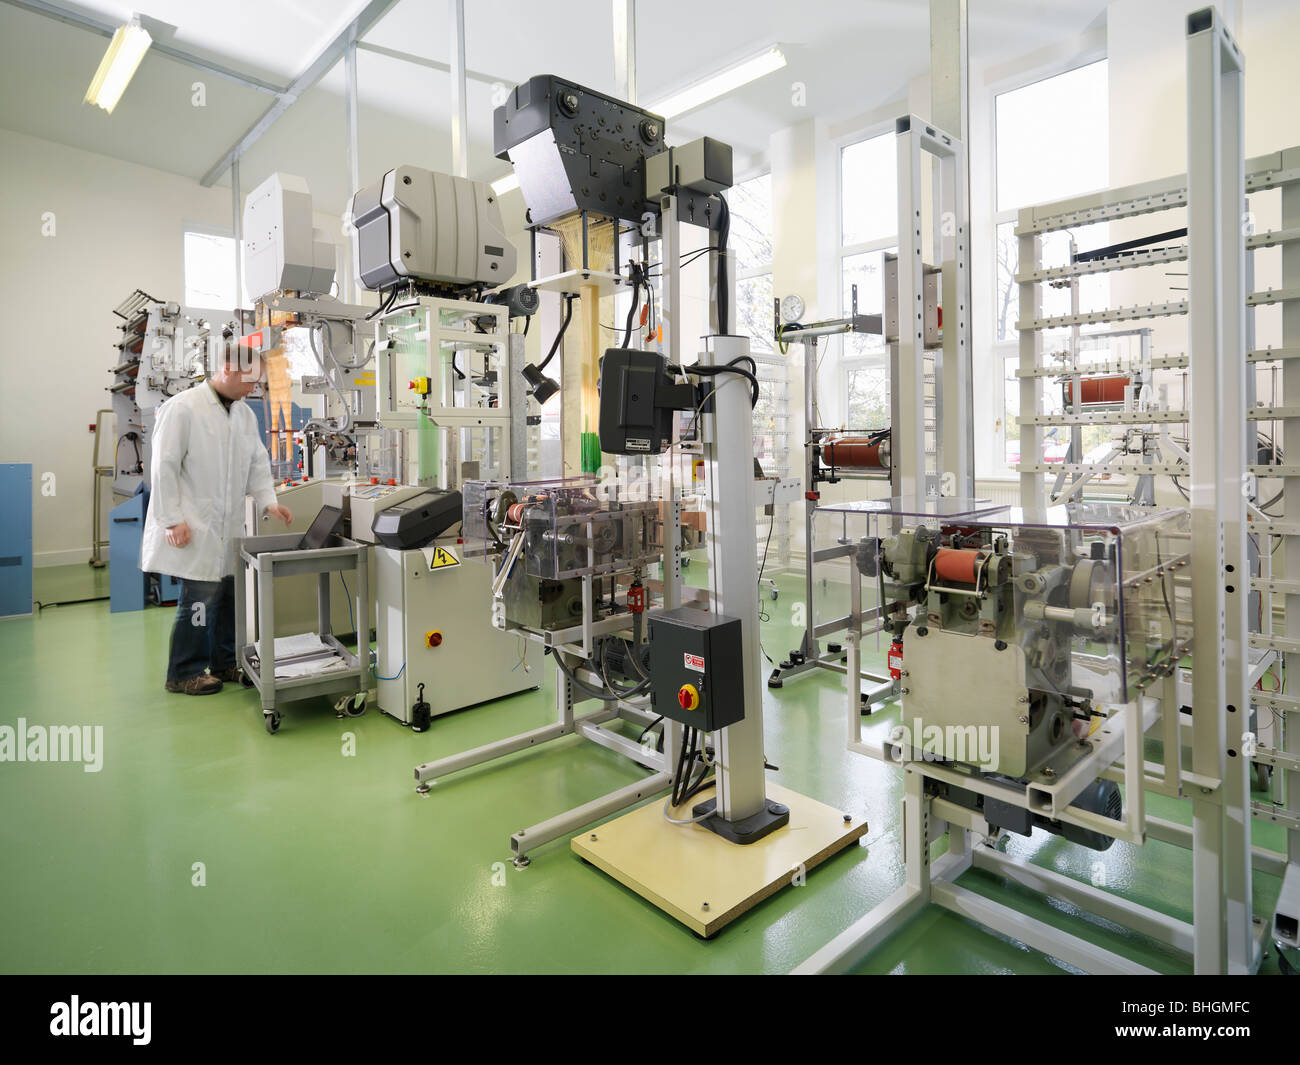 Tejido técnico de productos médicos Imagen De Stock